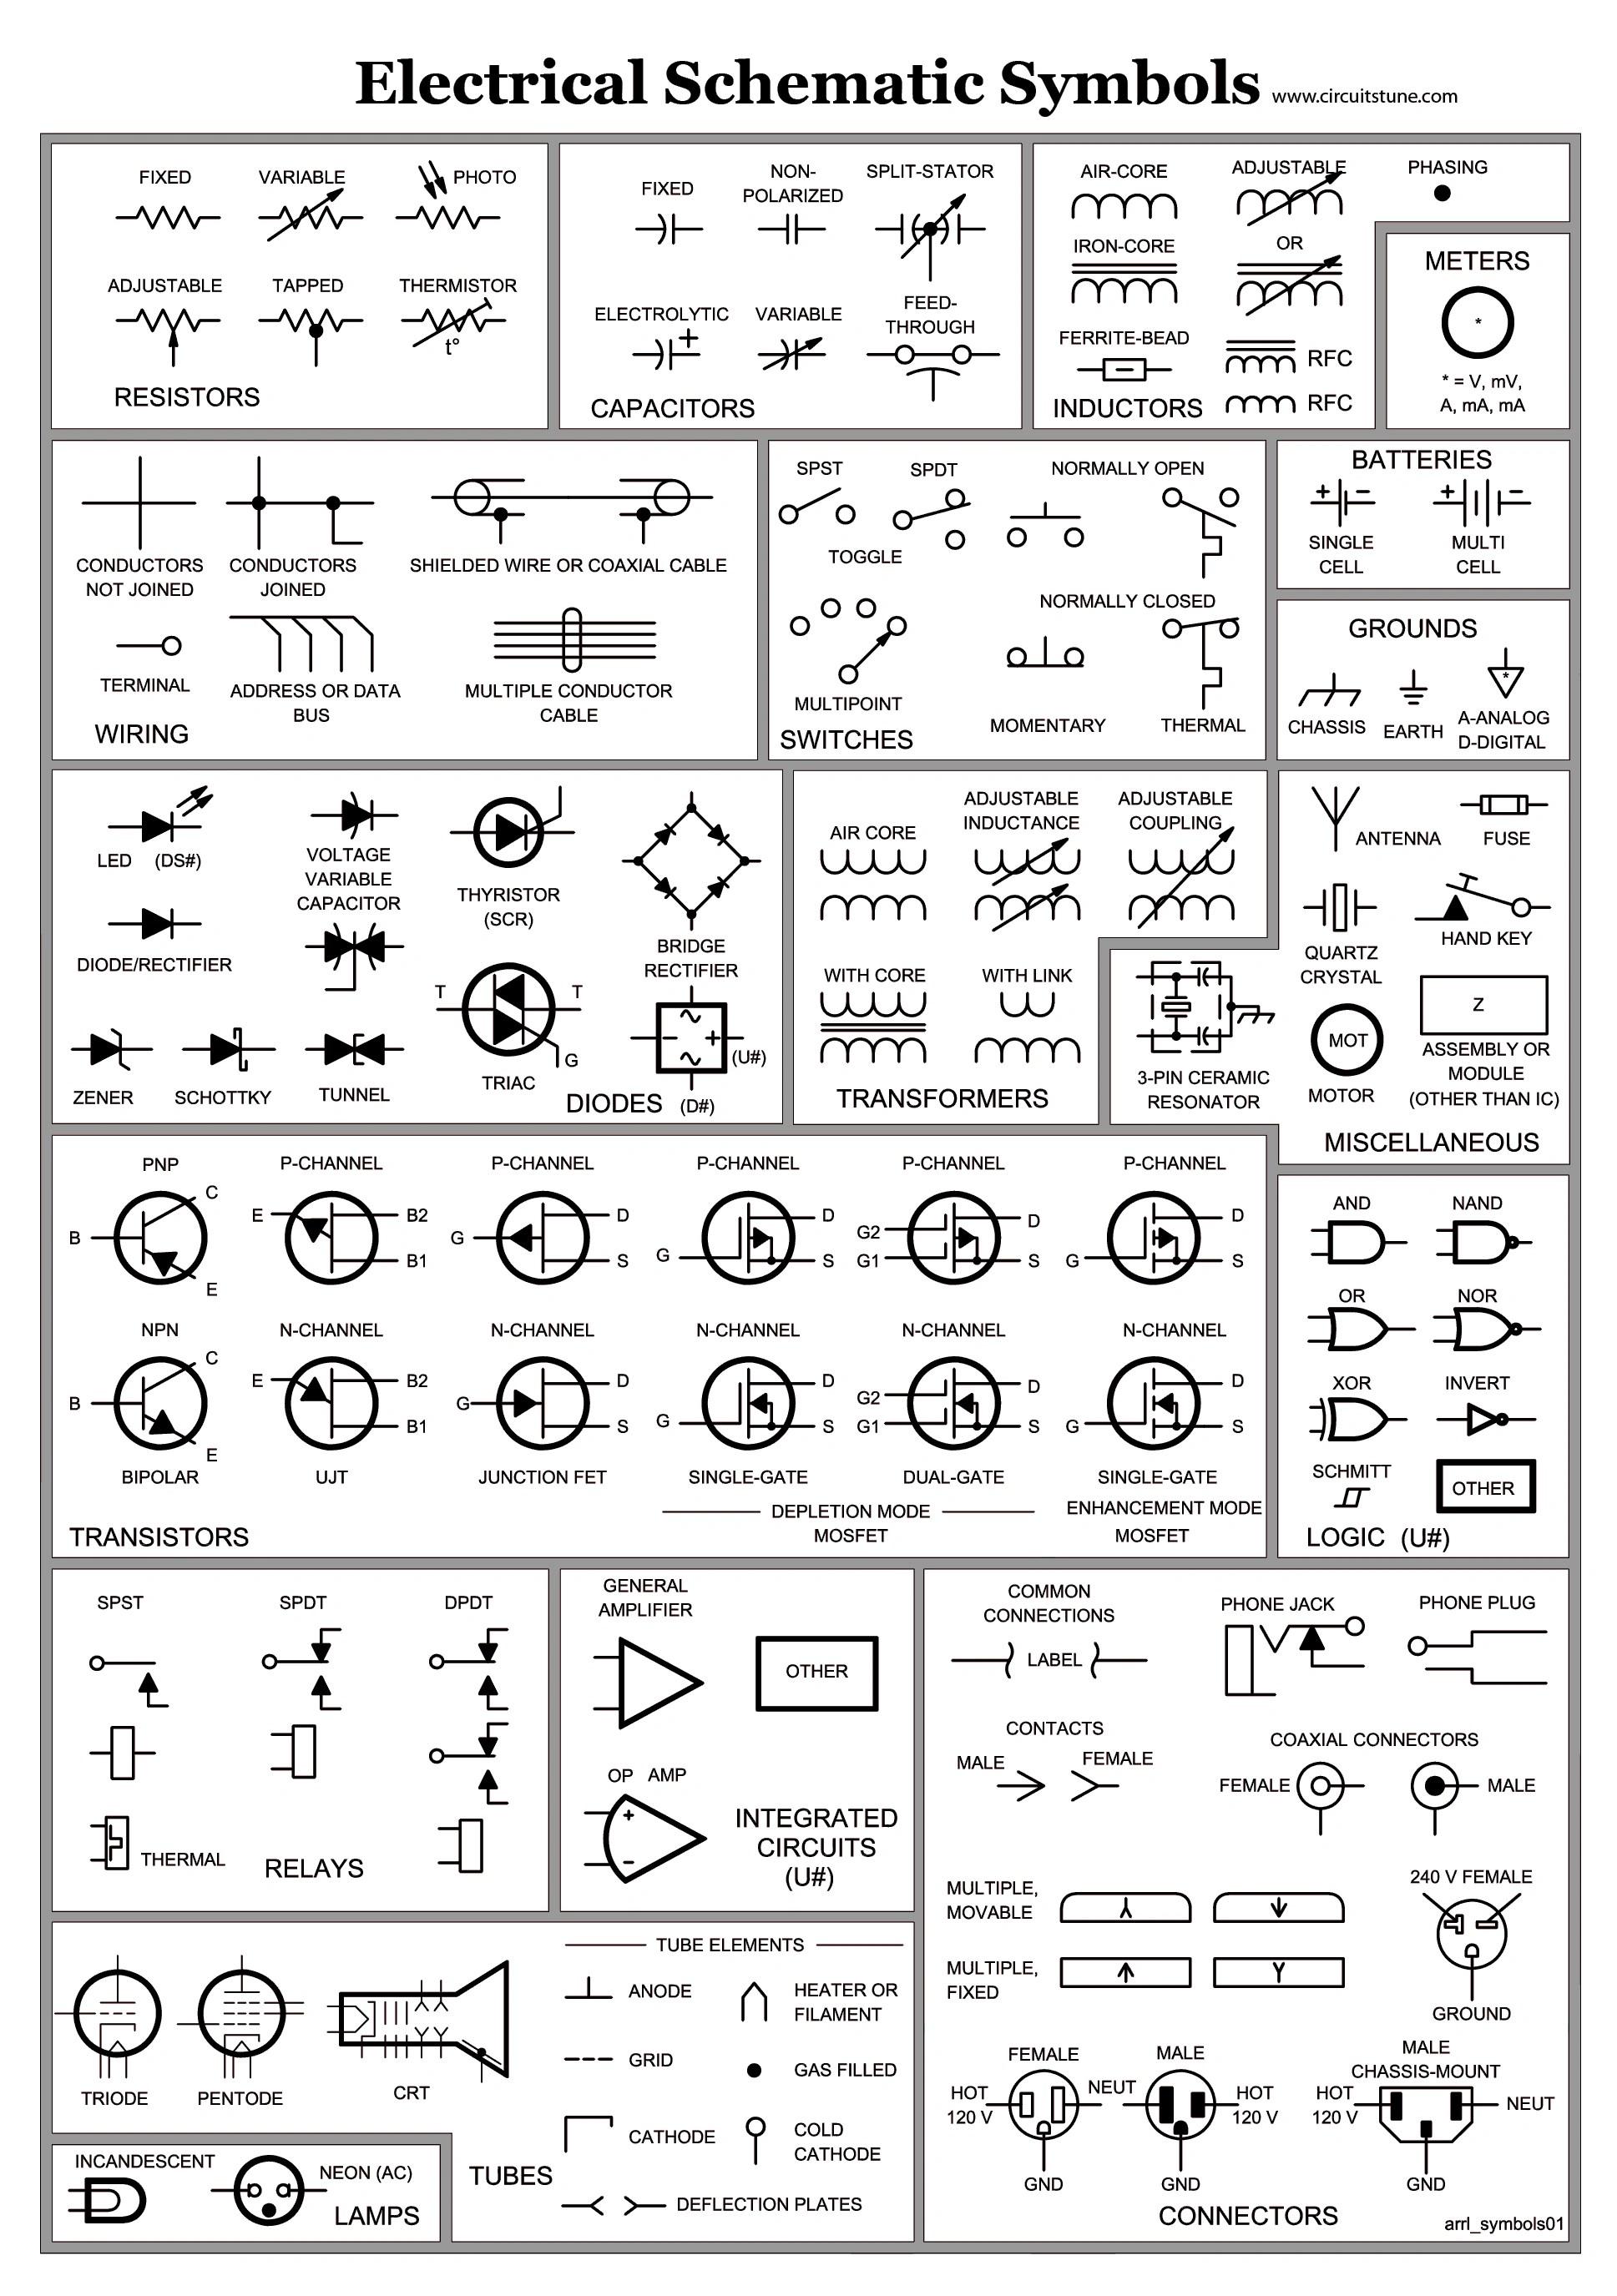 hight resolution of circuit diagram key just wiring diagram wiring diagram rj45 keystone jack circuit diagram key wiring diagram